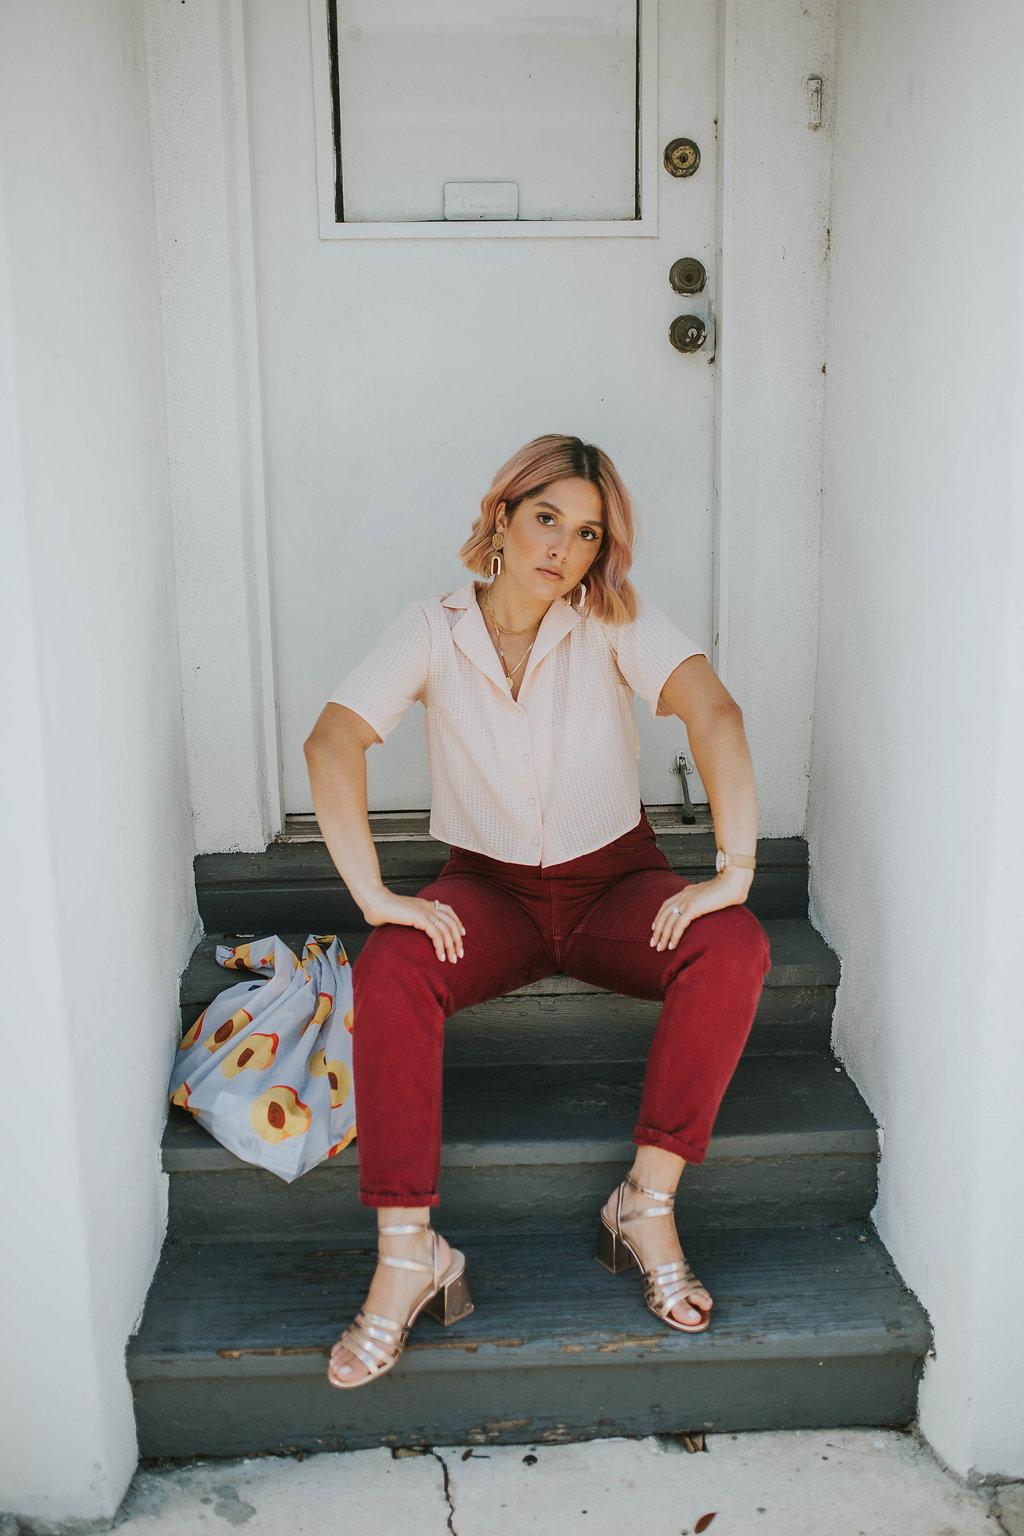 Bag:  Baggu Peach Reusable Bag | Shoes: Forever 21 | Top: Forever 21 | Jeans: Zara